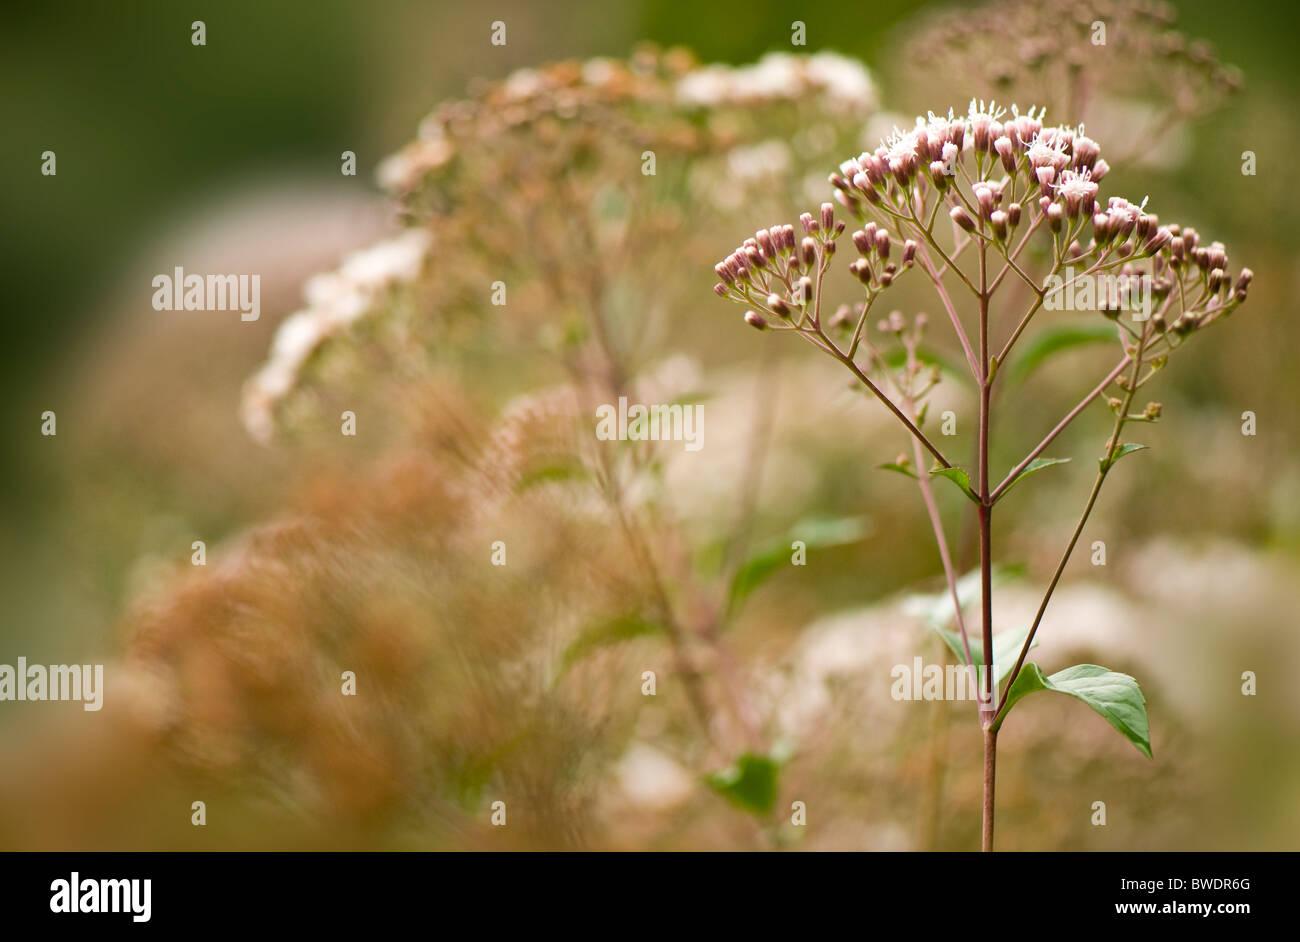 Eupatorium ligustrinum syn micranthum  - Incense Bush with small white flowers - Stock Image